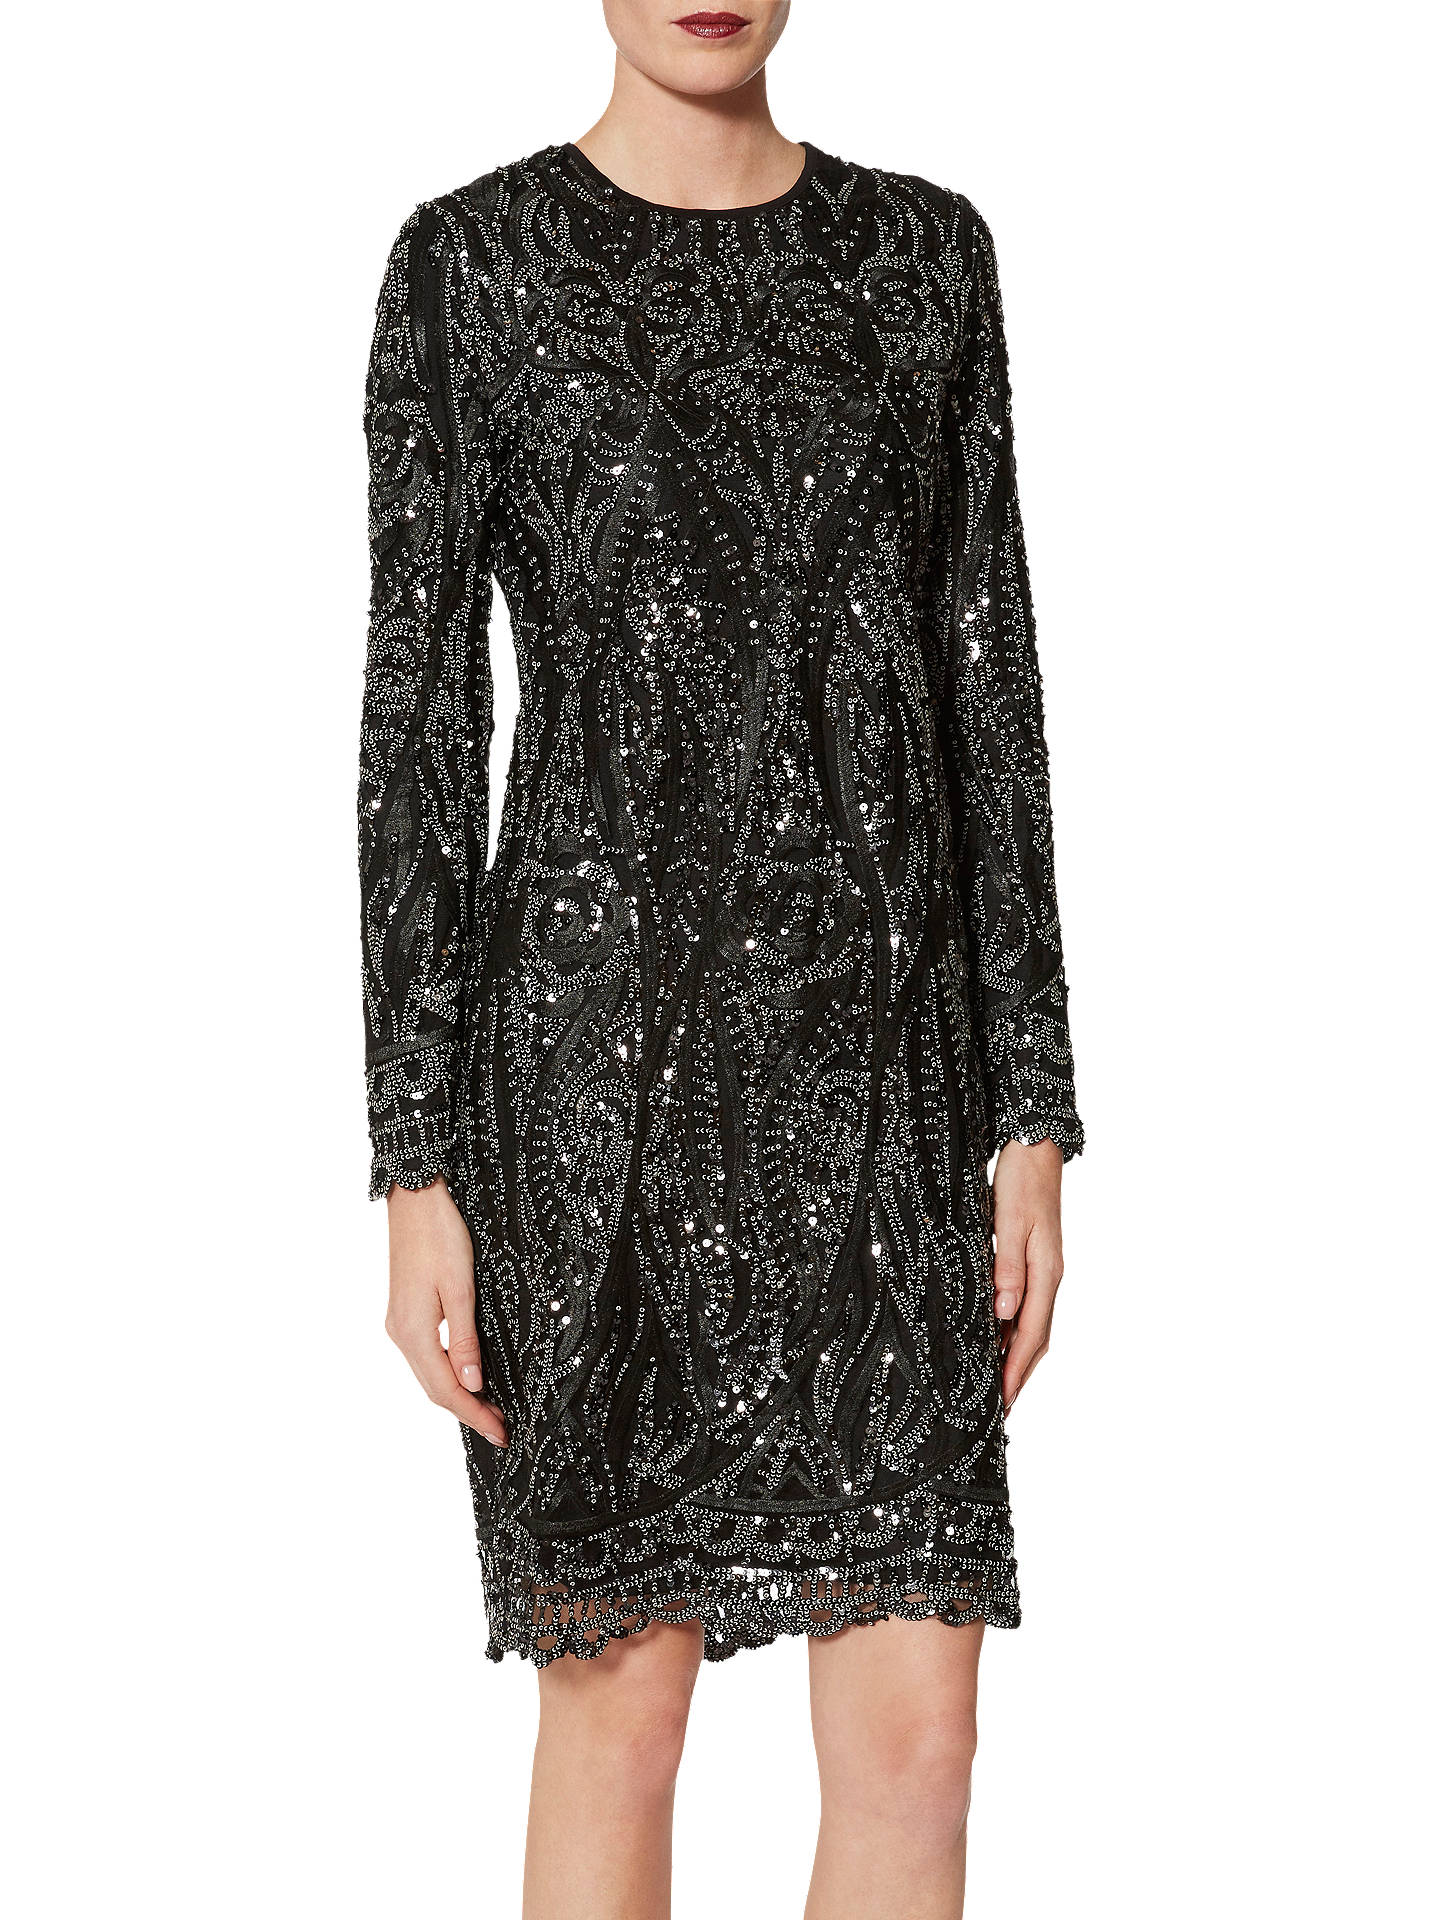 0c227cef4da Buy Gina Bacconi Marzena Swirl Embroidered Dress